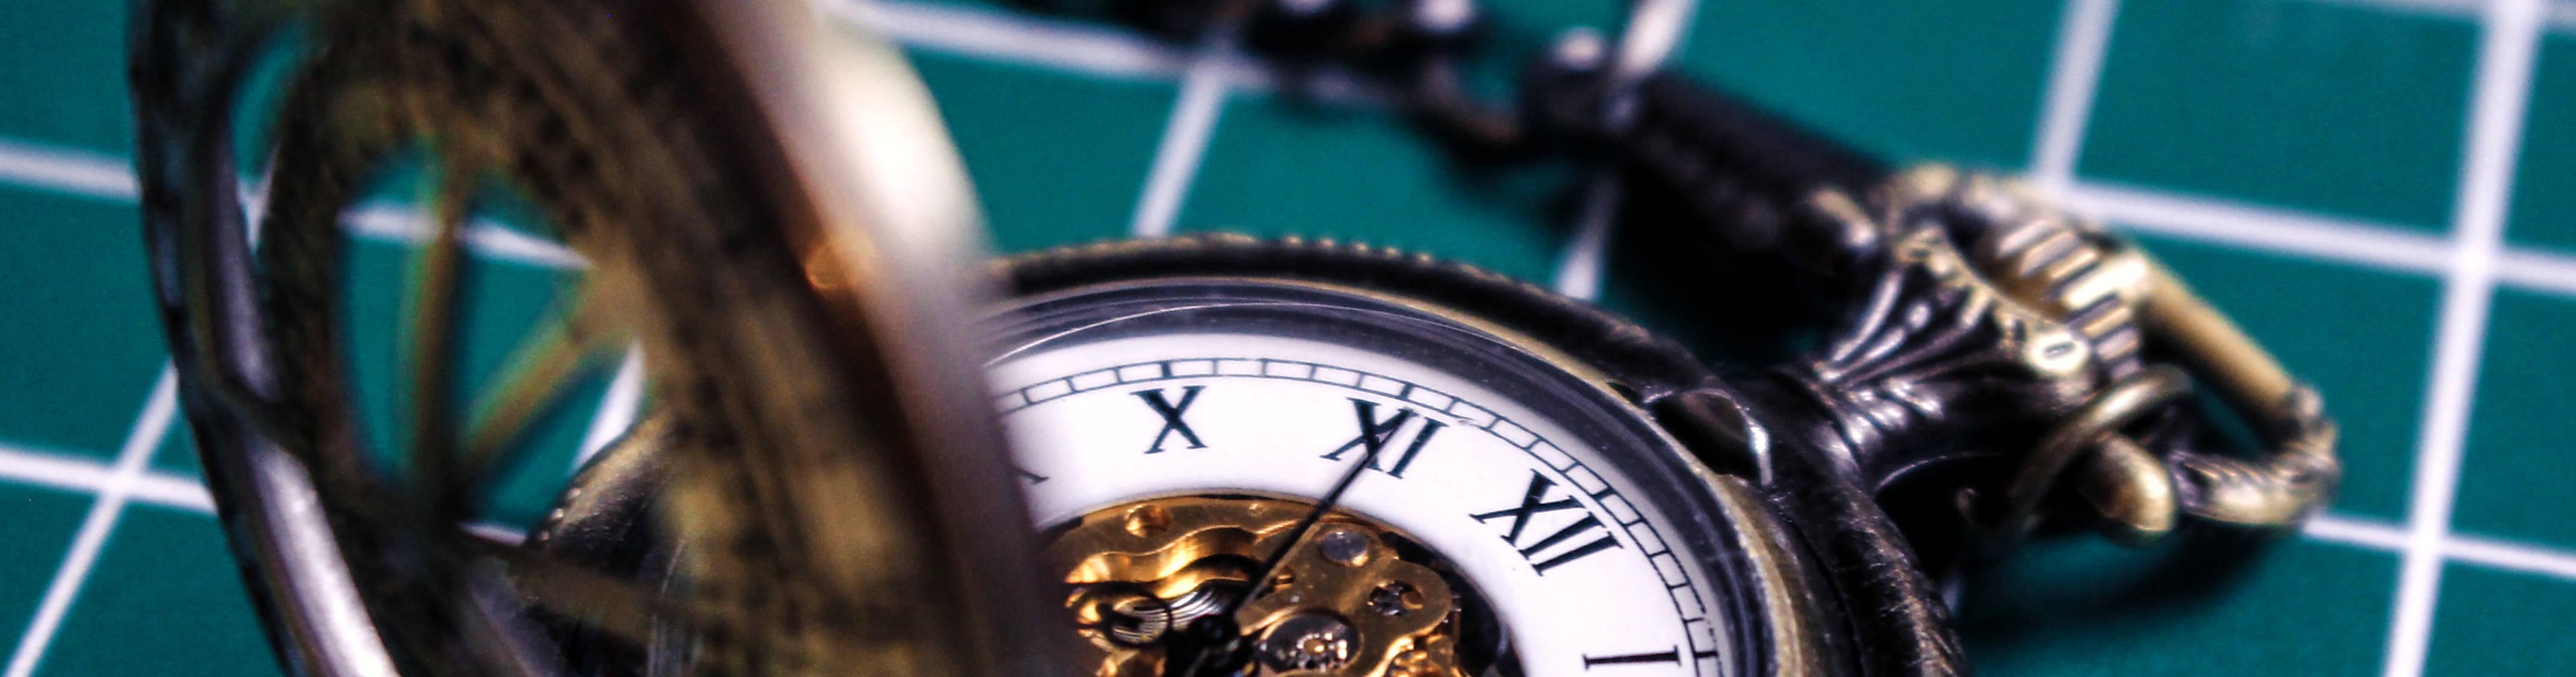 Clock (Shawn-lee-vuEiSEegQAk-unsplash) cut-out